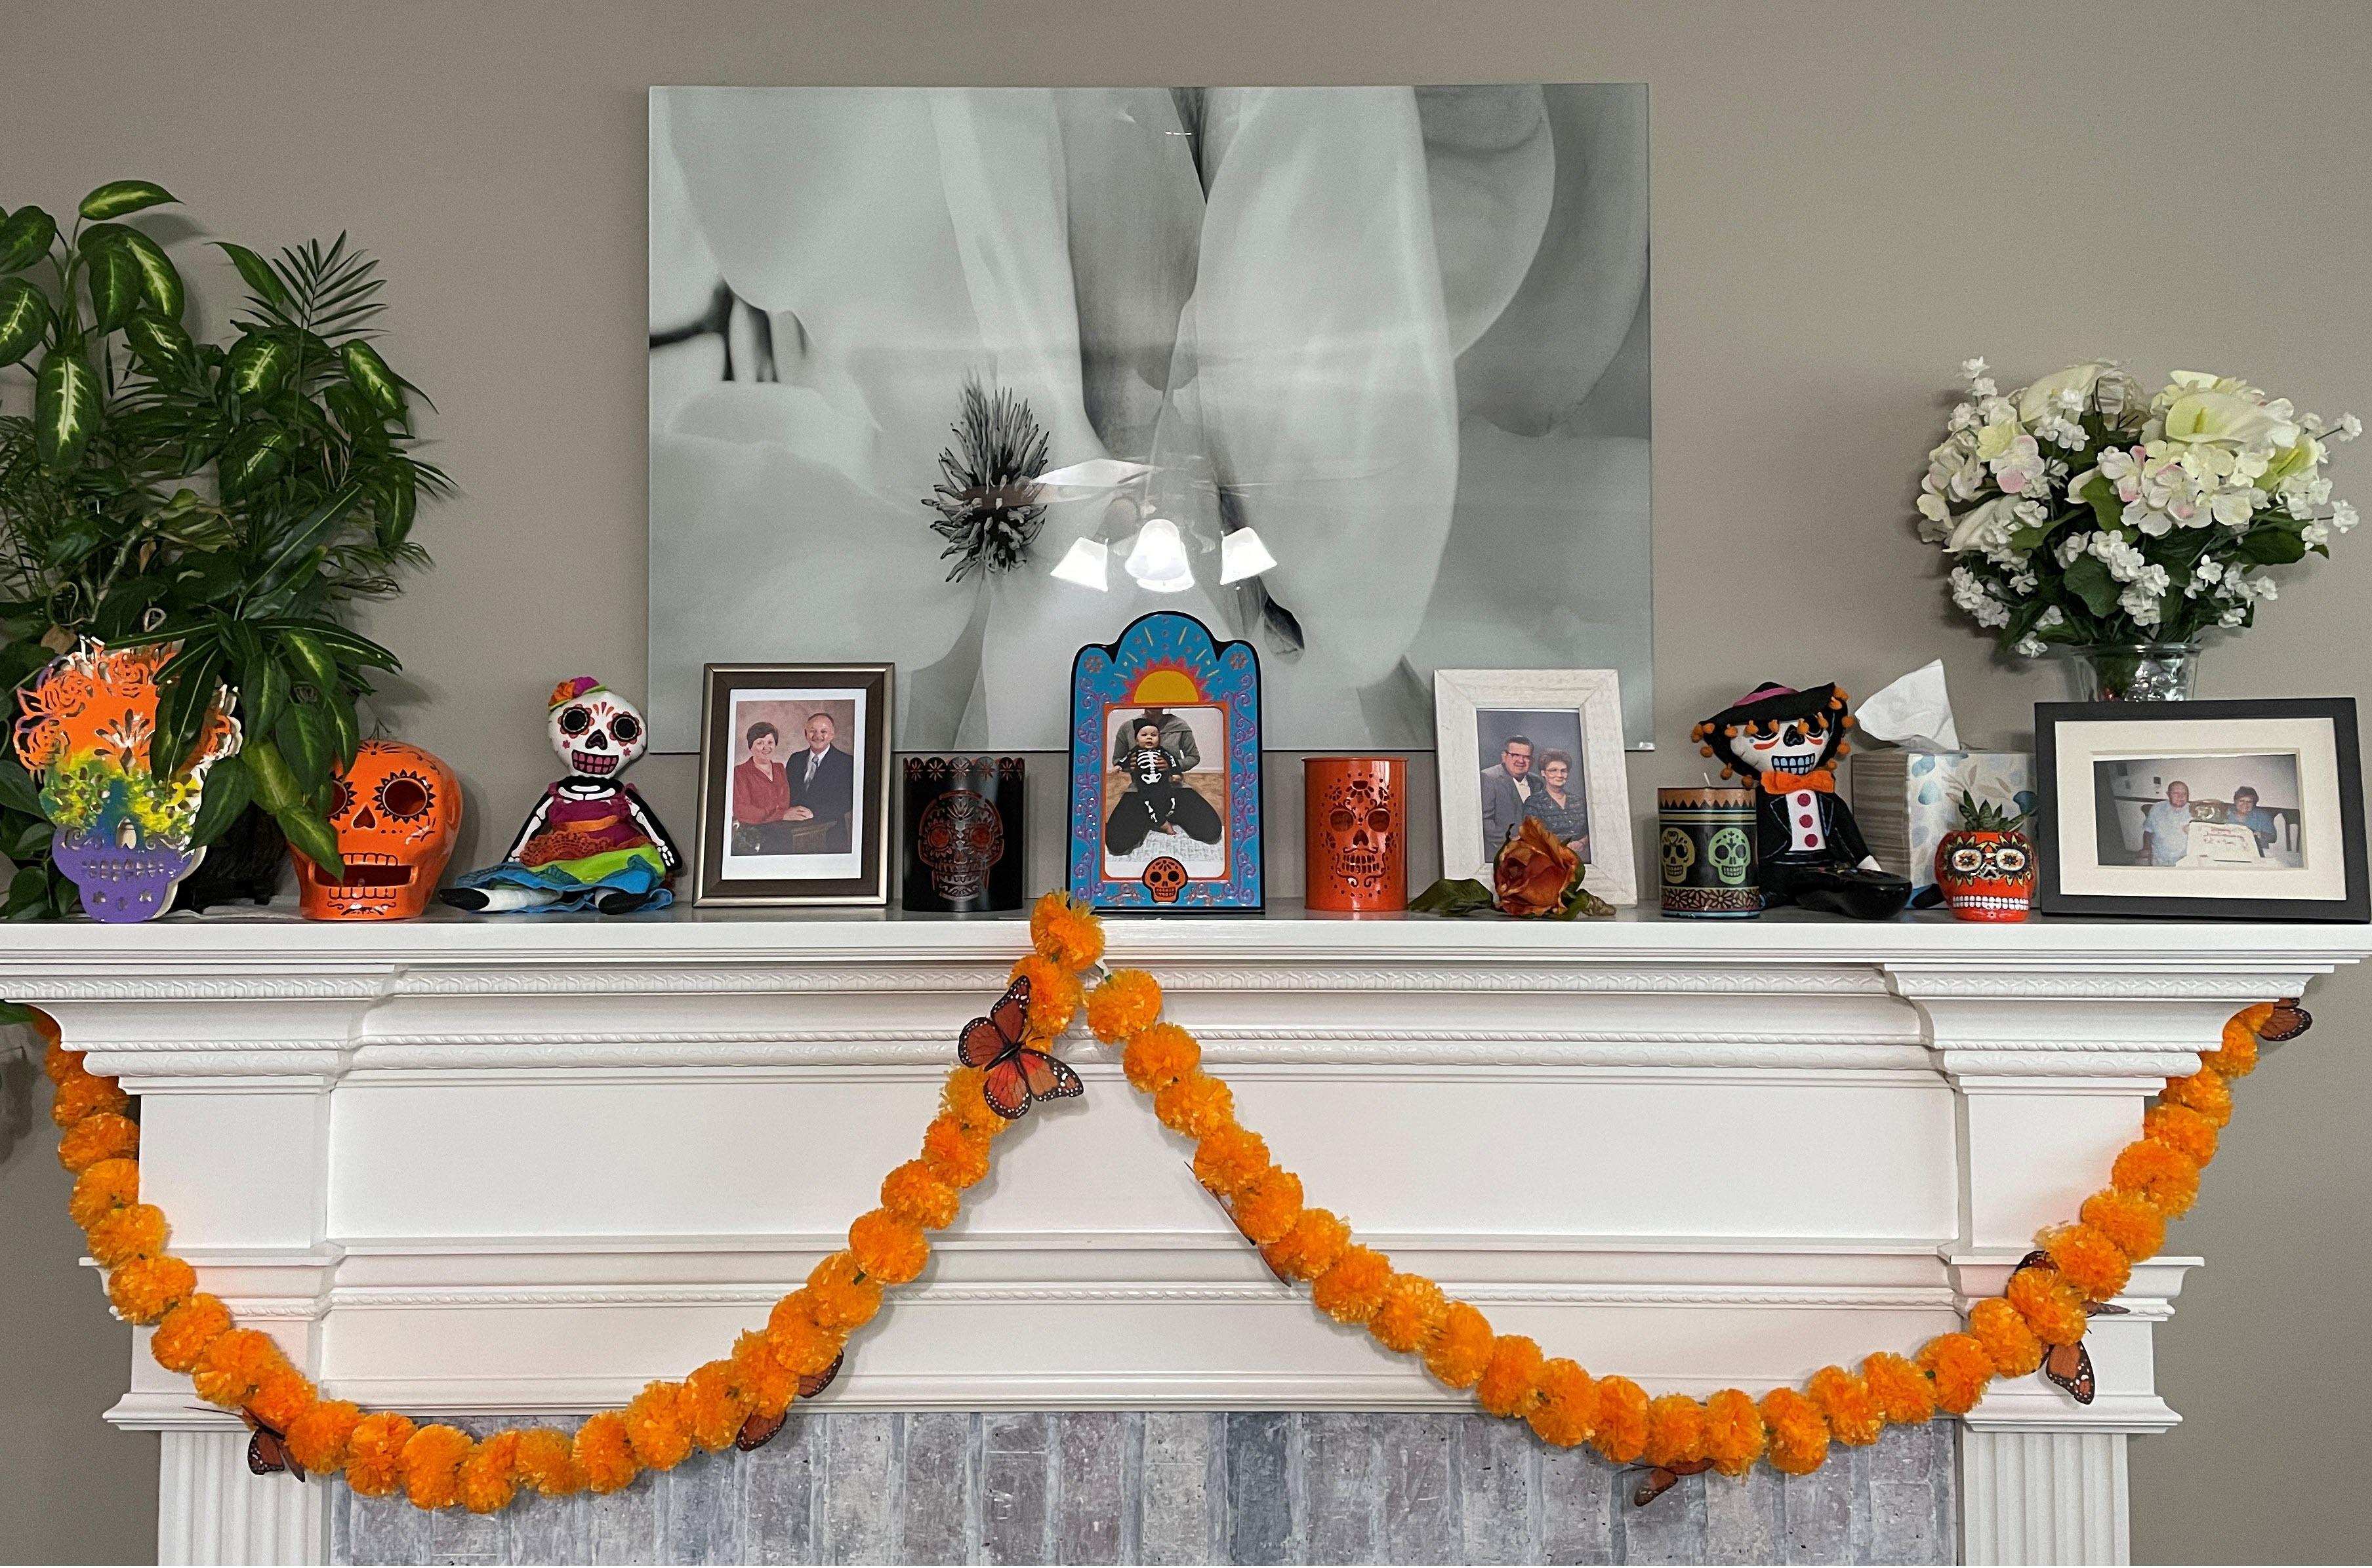 A Holiday to Celebrate Our Children: Dia de los Muertos